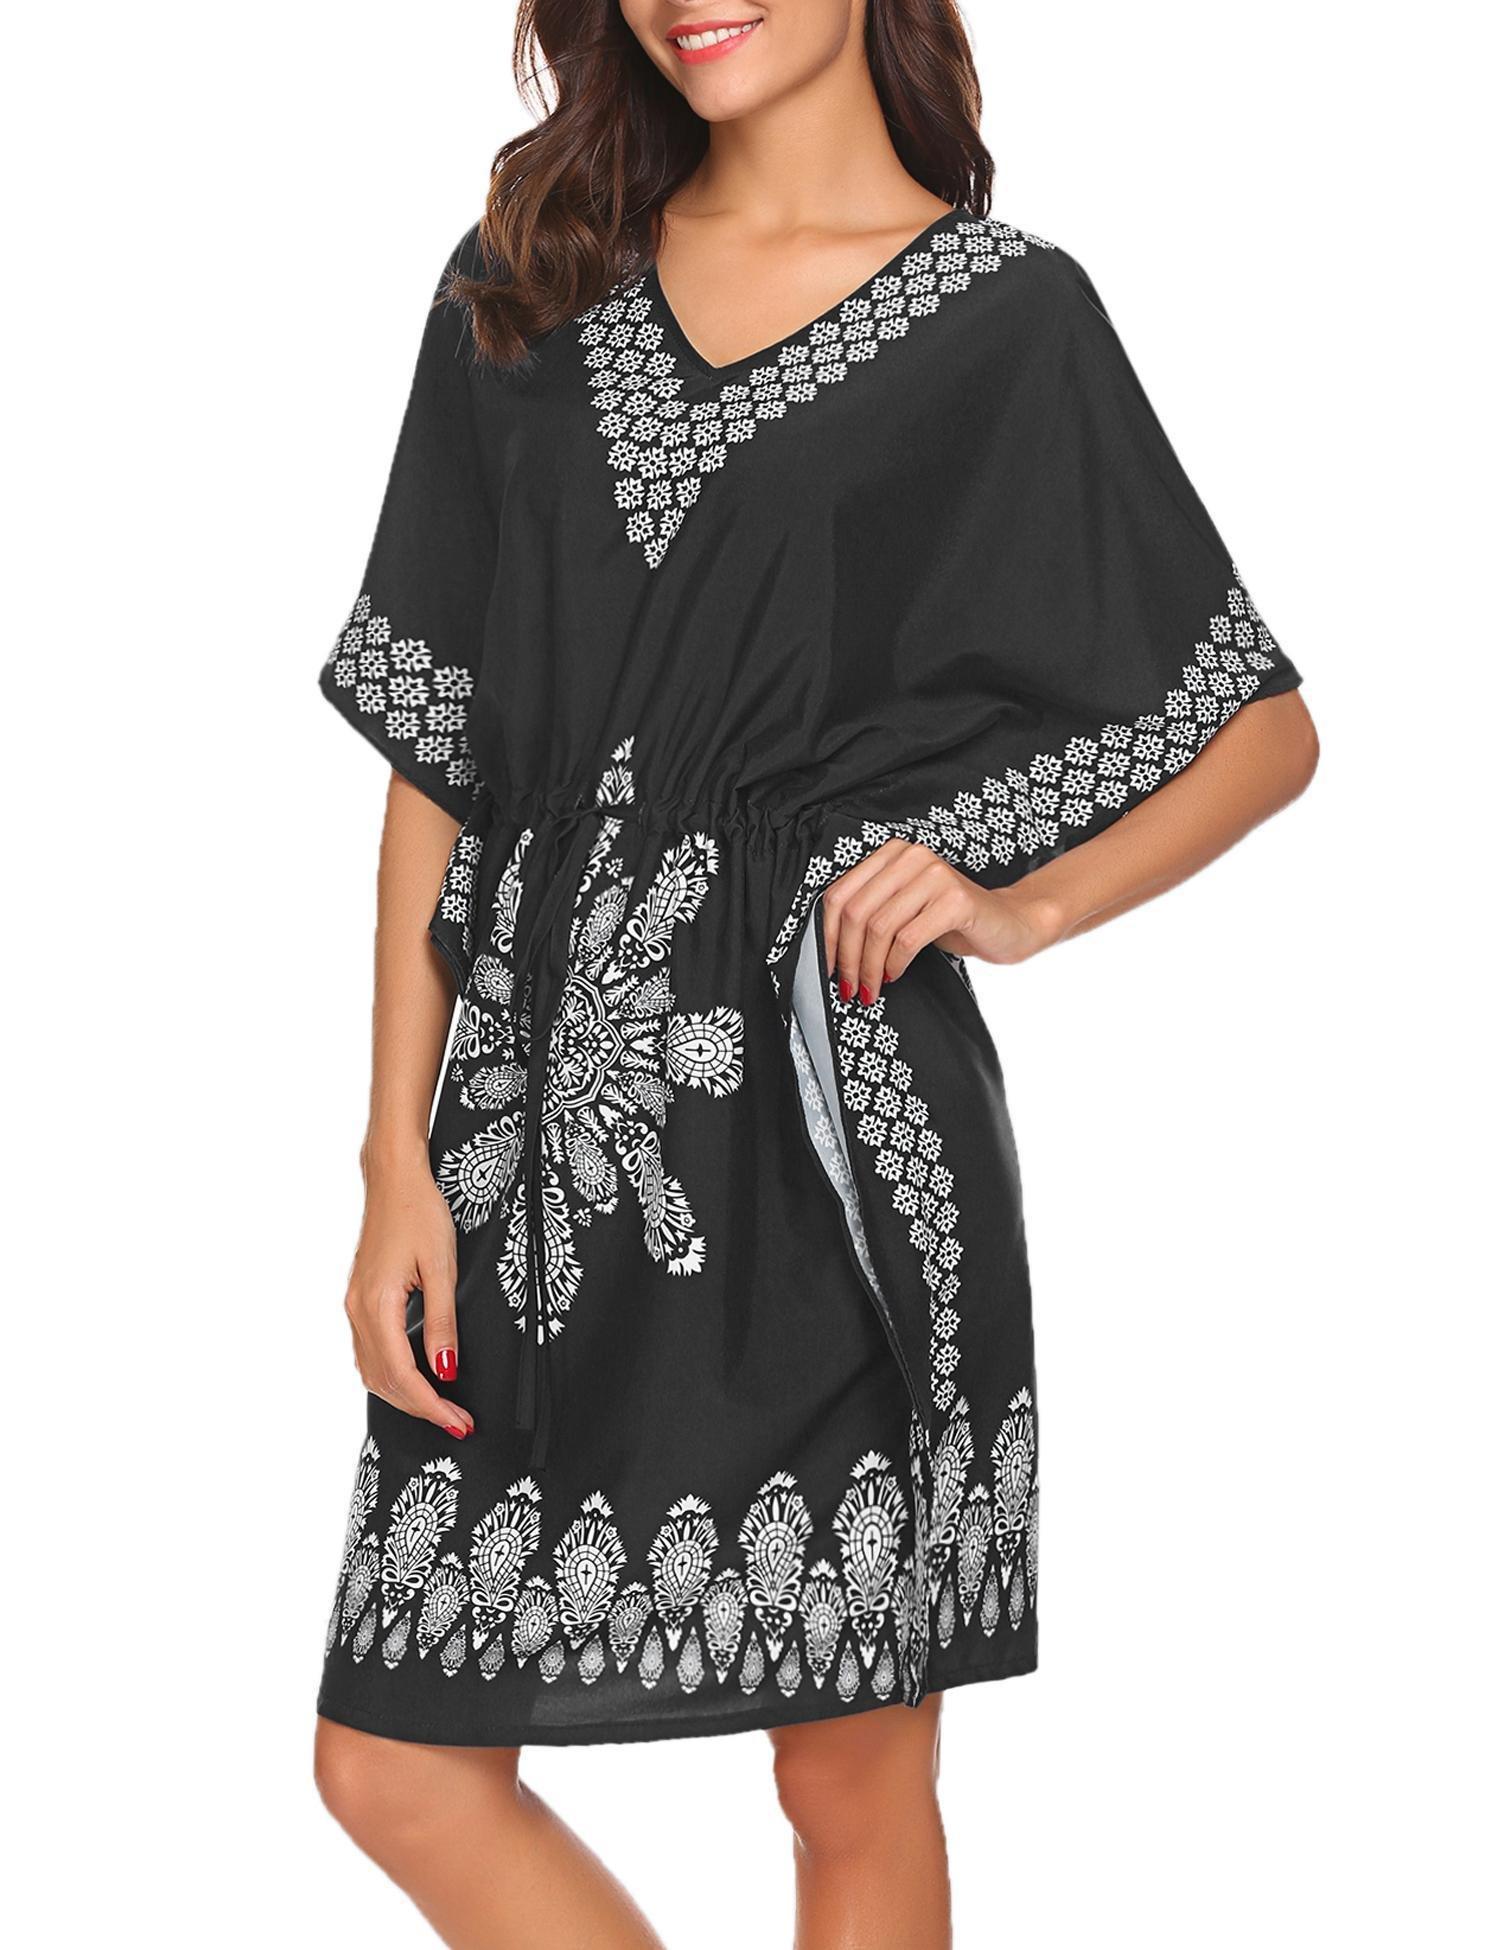 UNibelle Women's V Neck Swimwear Cover up 3/4 Sleeve Embroidered Tunic Dresses